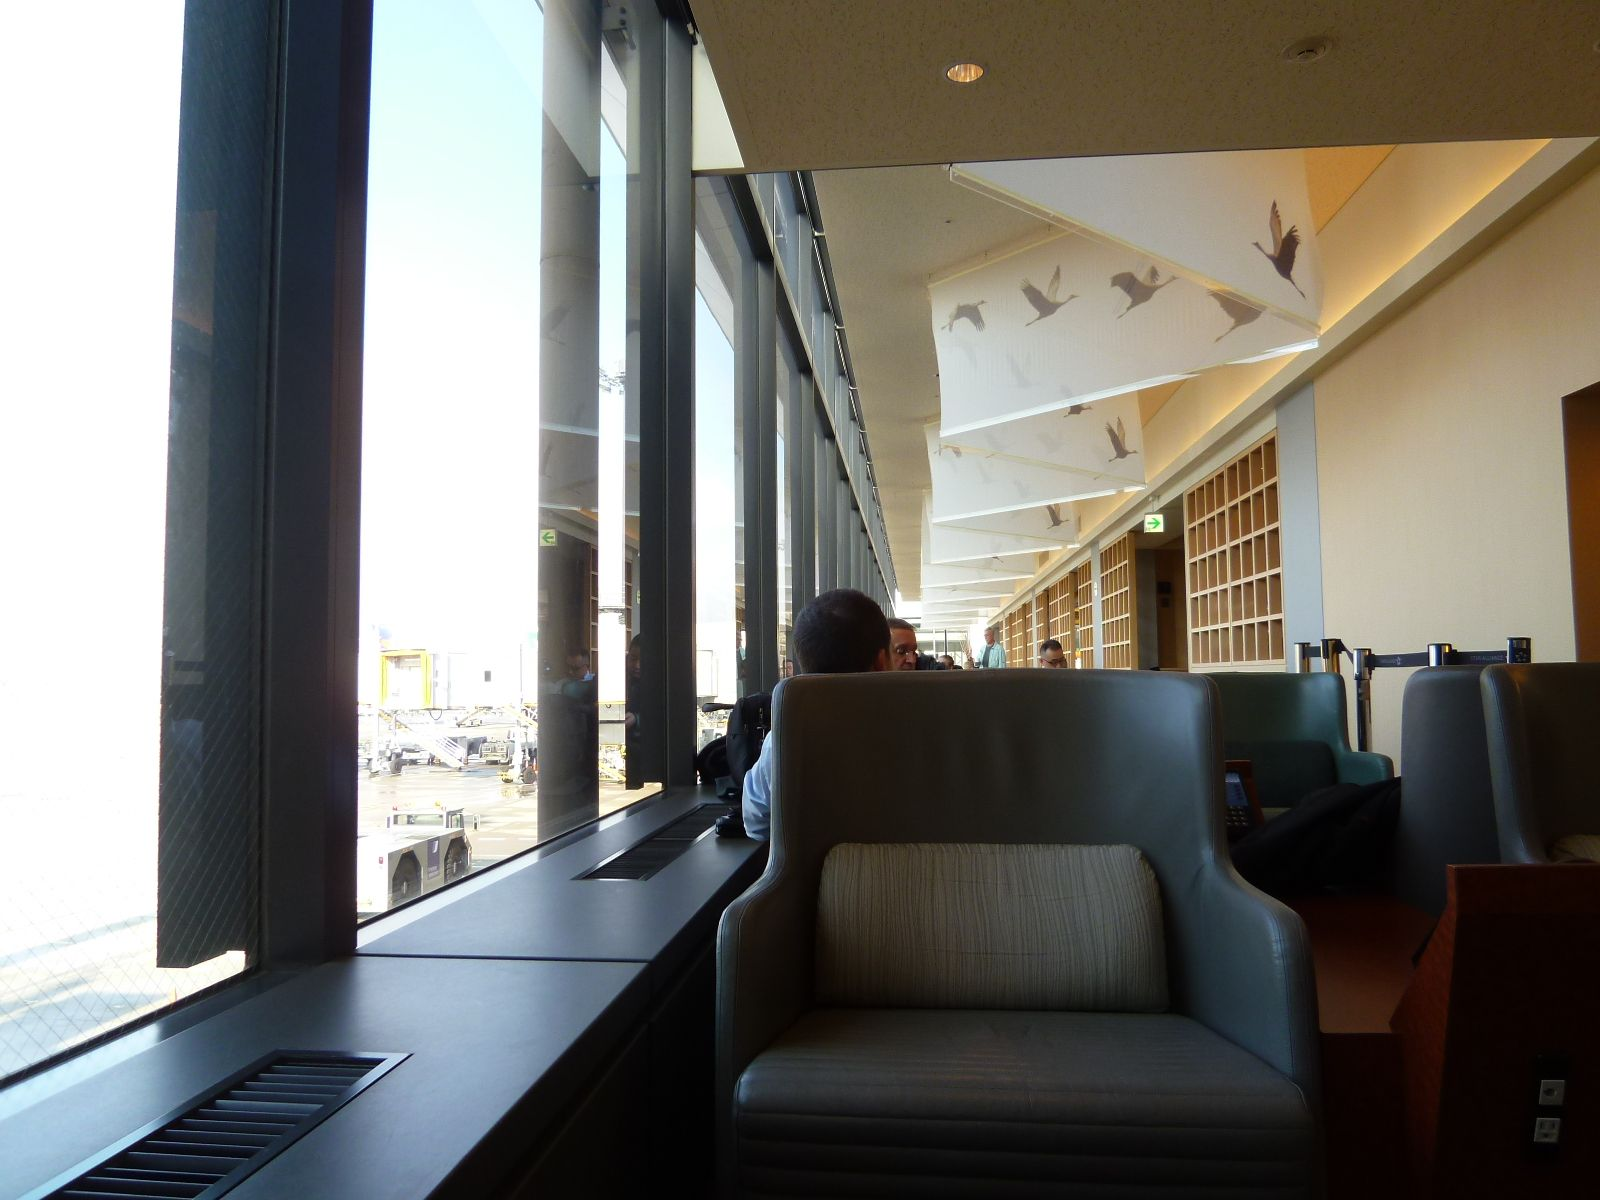 Aeroporto Tokyo : How to get from haneda airport to tokyo station u japan travel